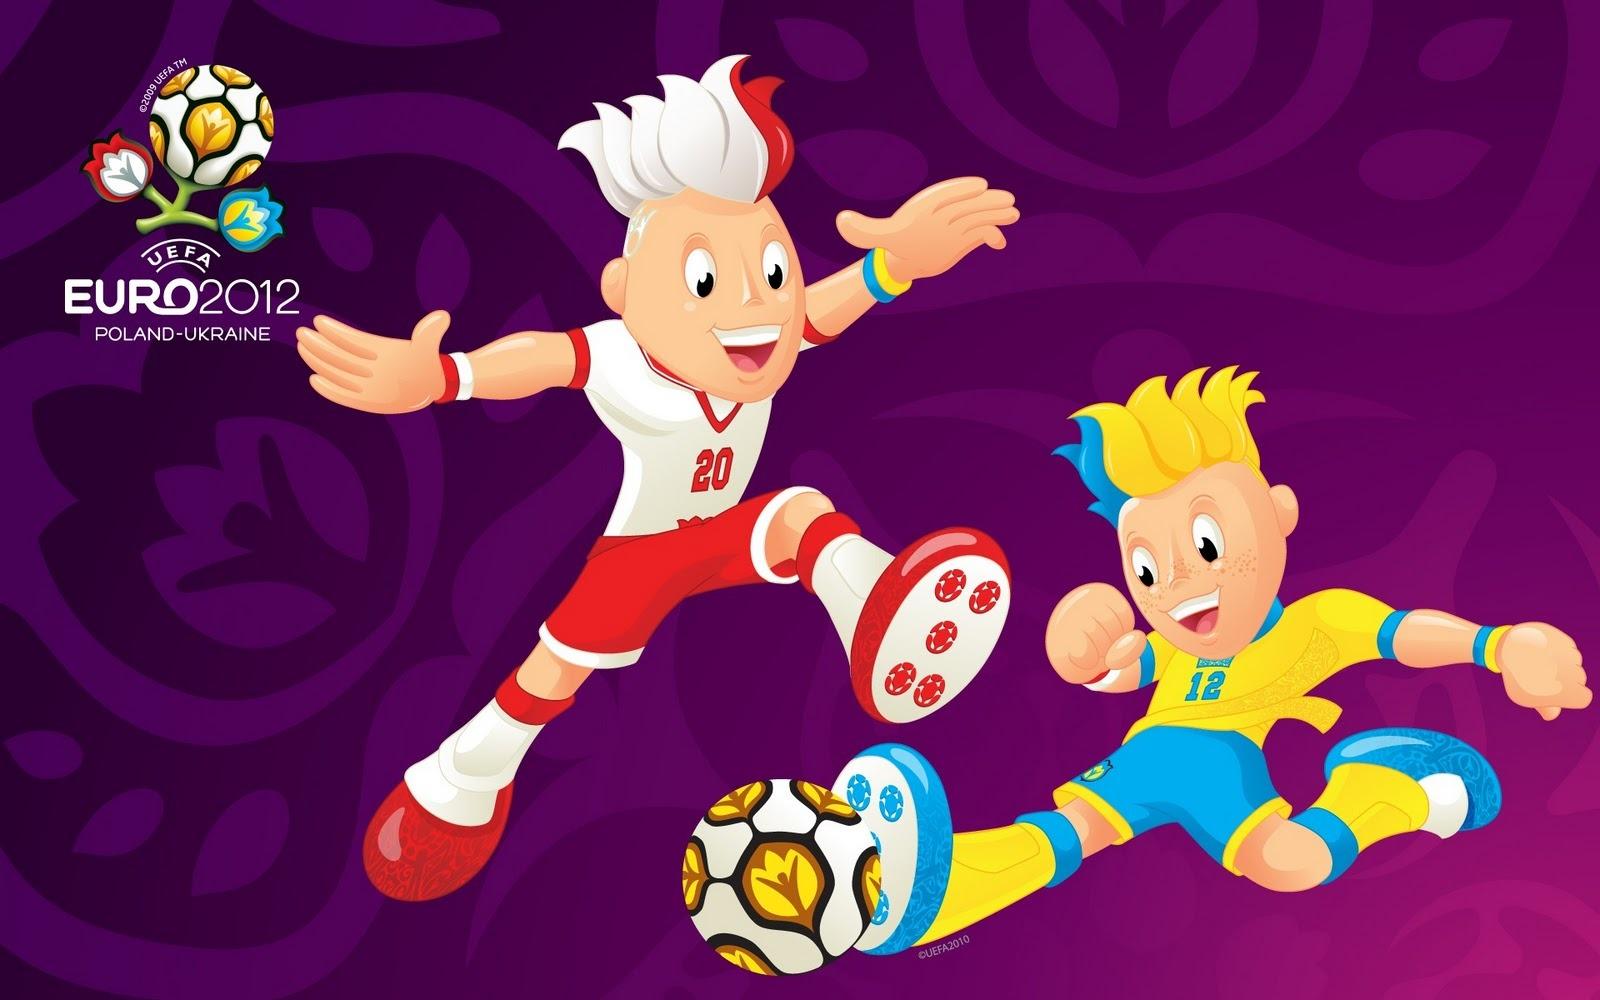 Fondos de Pantalla Euro 2012   Taringa 1600x1000